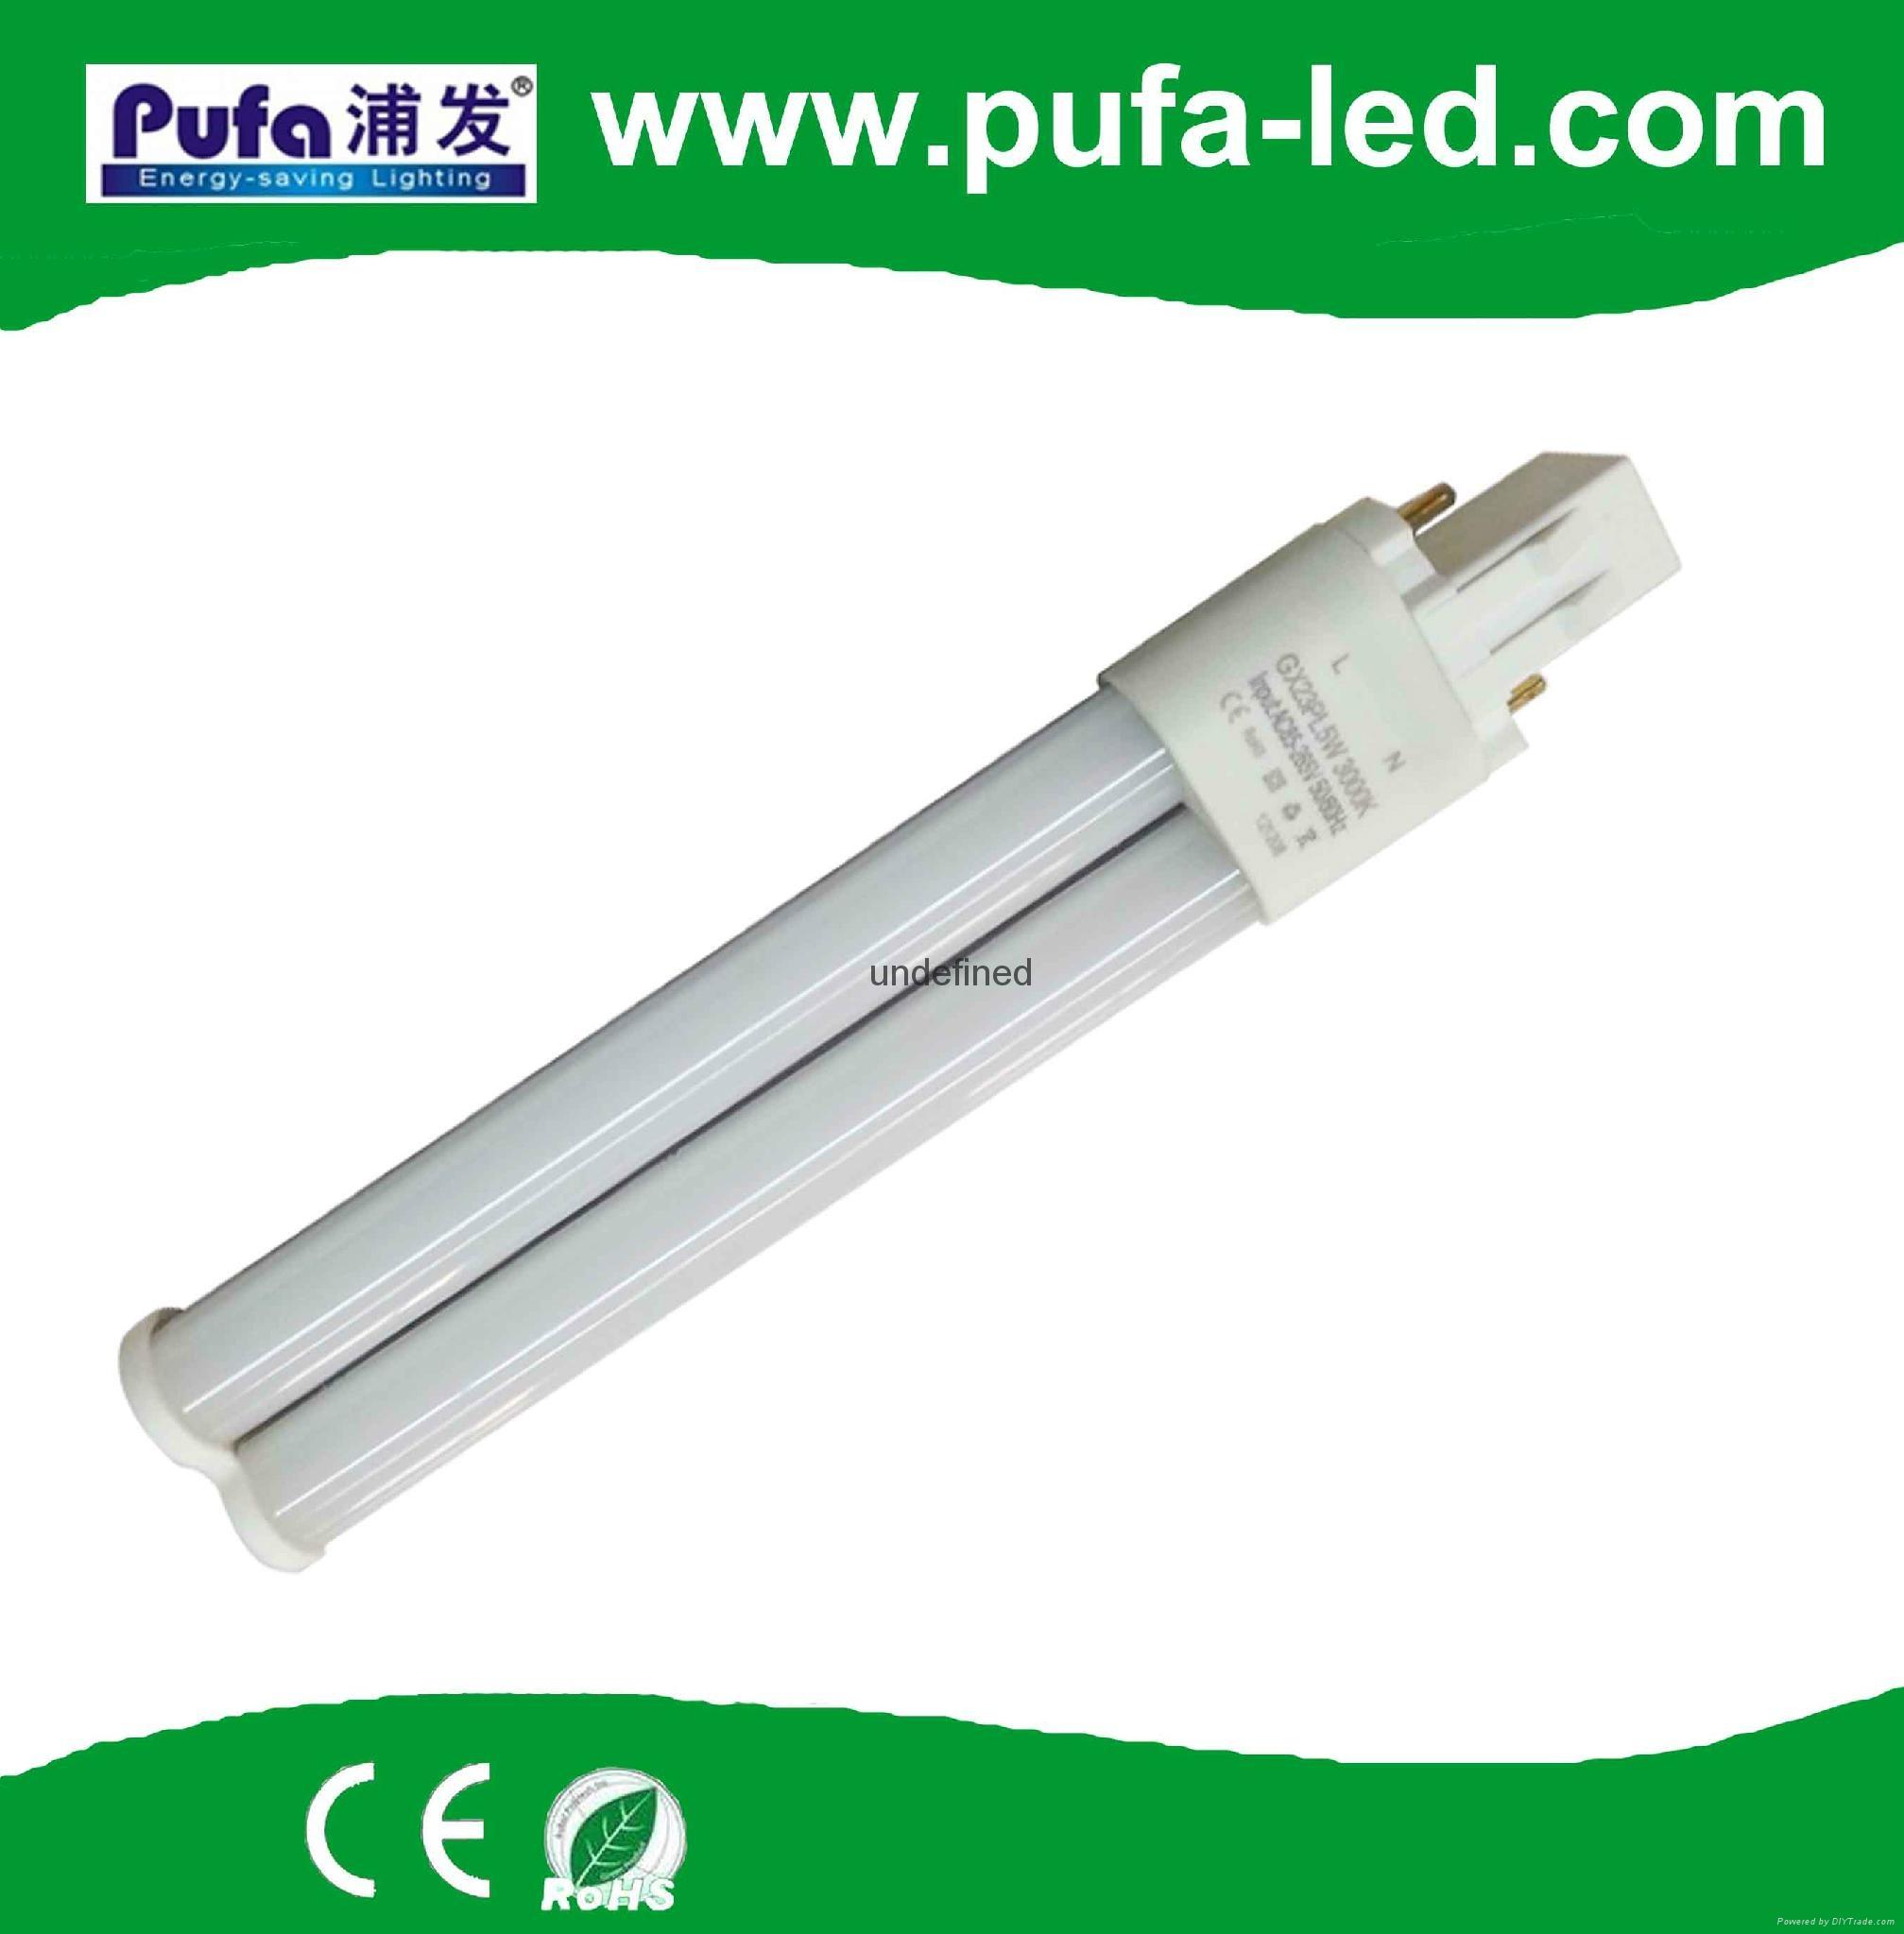 GX23 LED 横插灯 9W  1